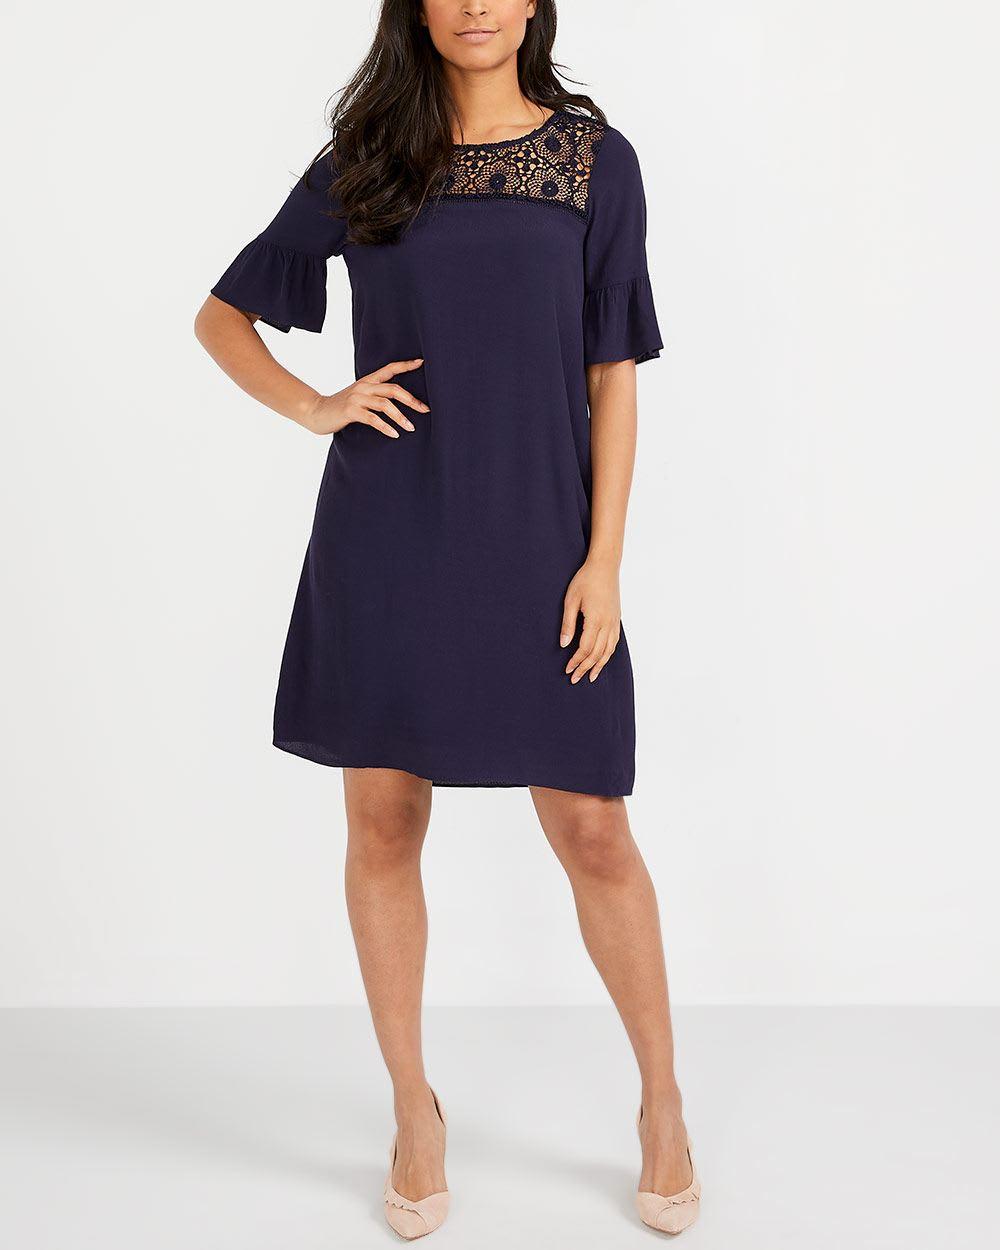 Ruffle Sleeve Crochet Dress